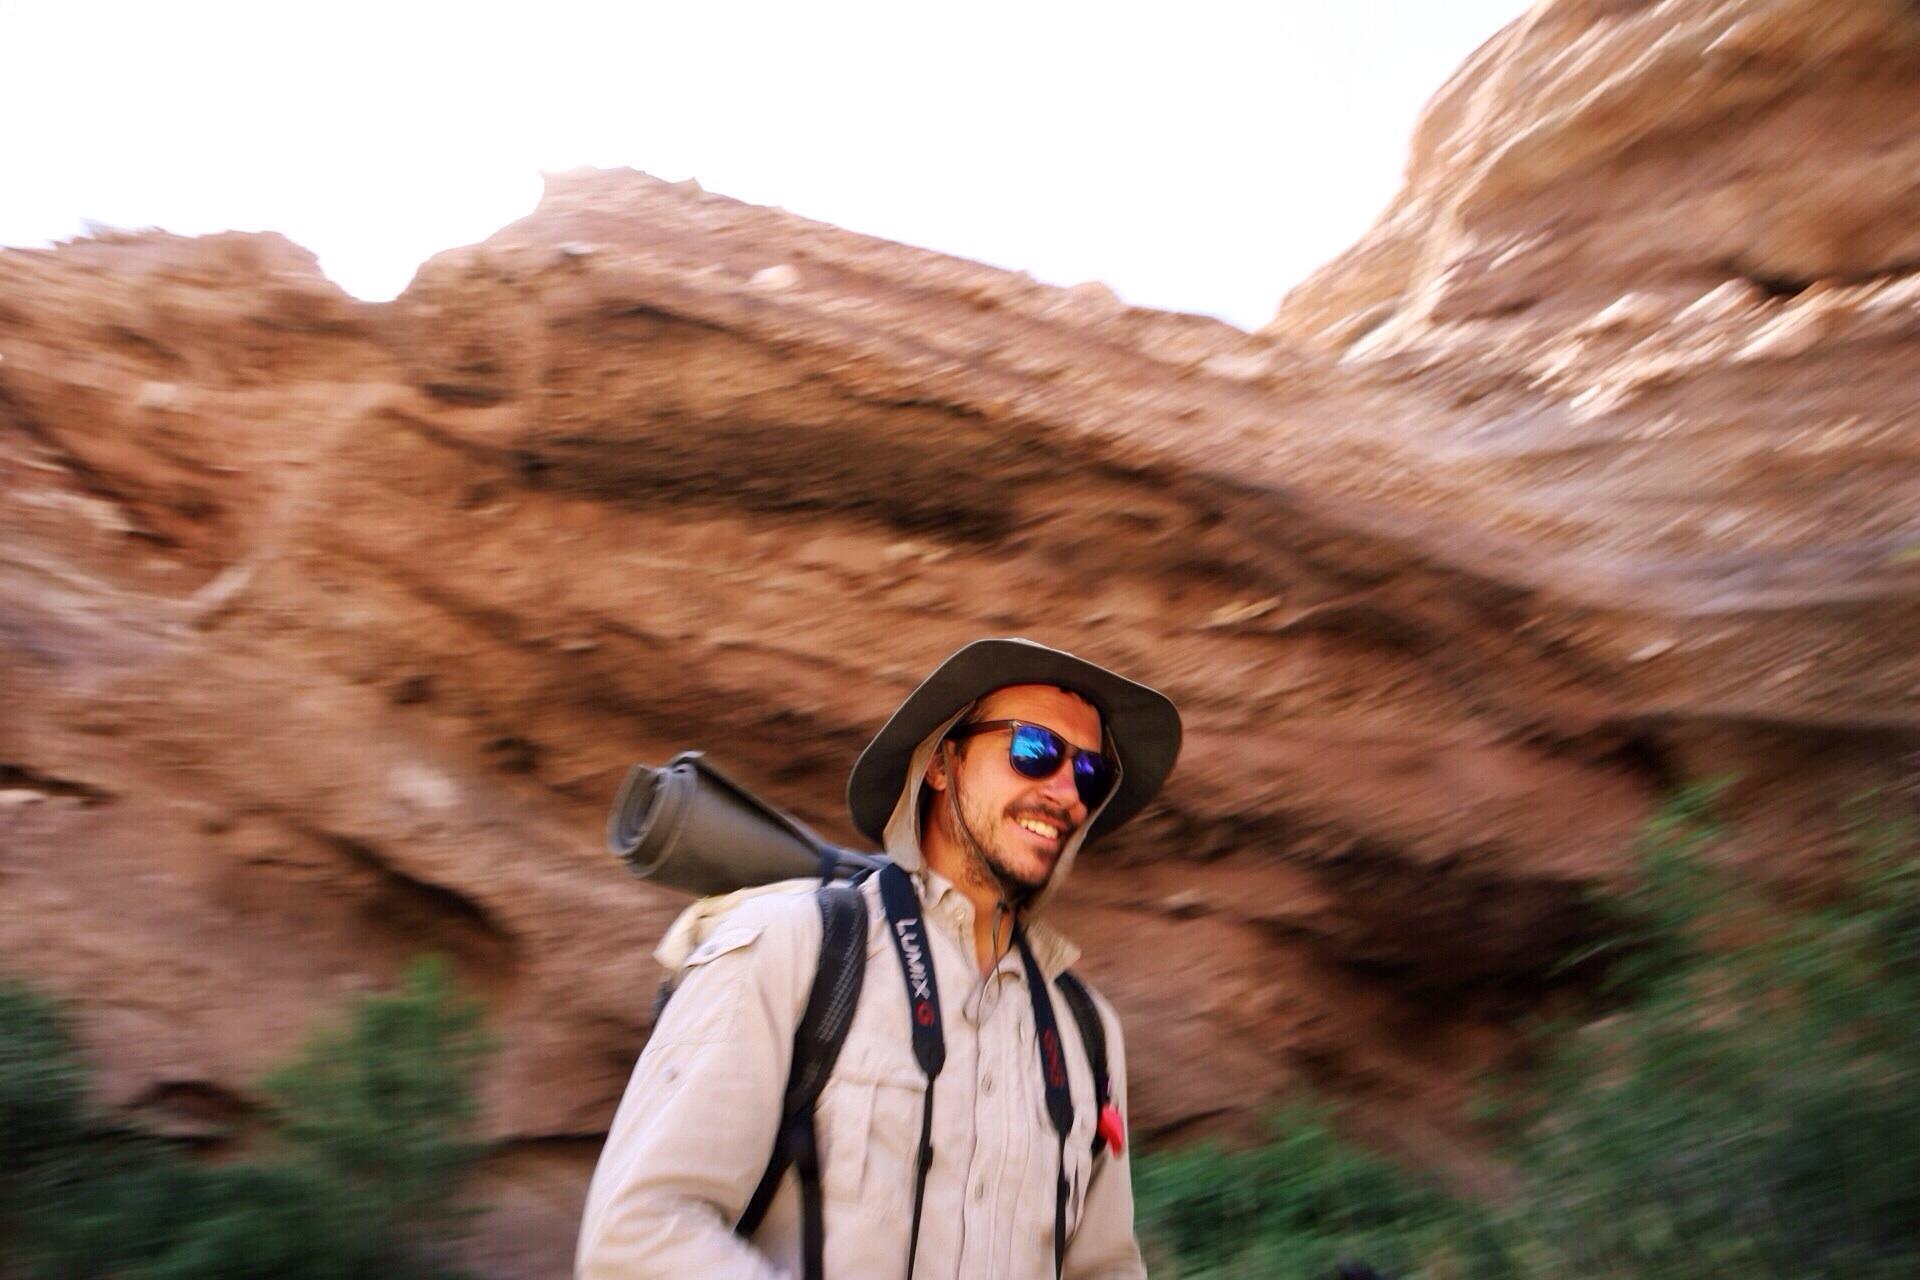 Vasquez Rocks. Half'n'Half was all smiles walking through this place.